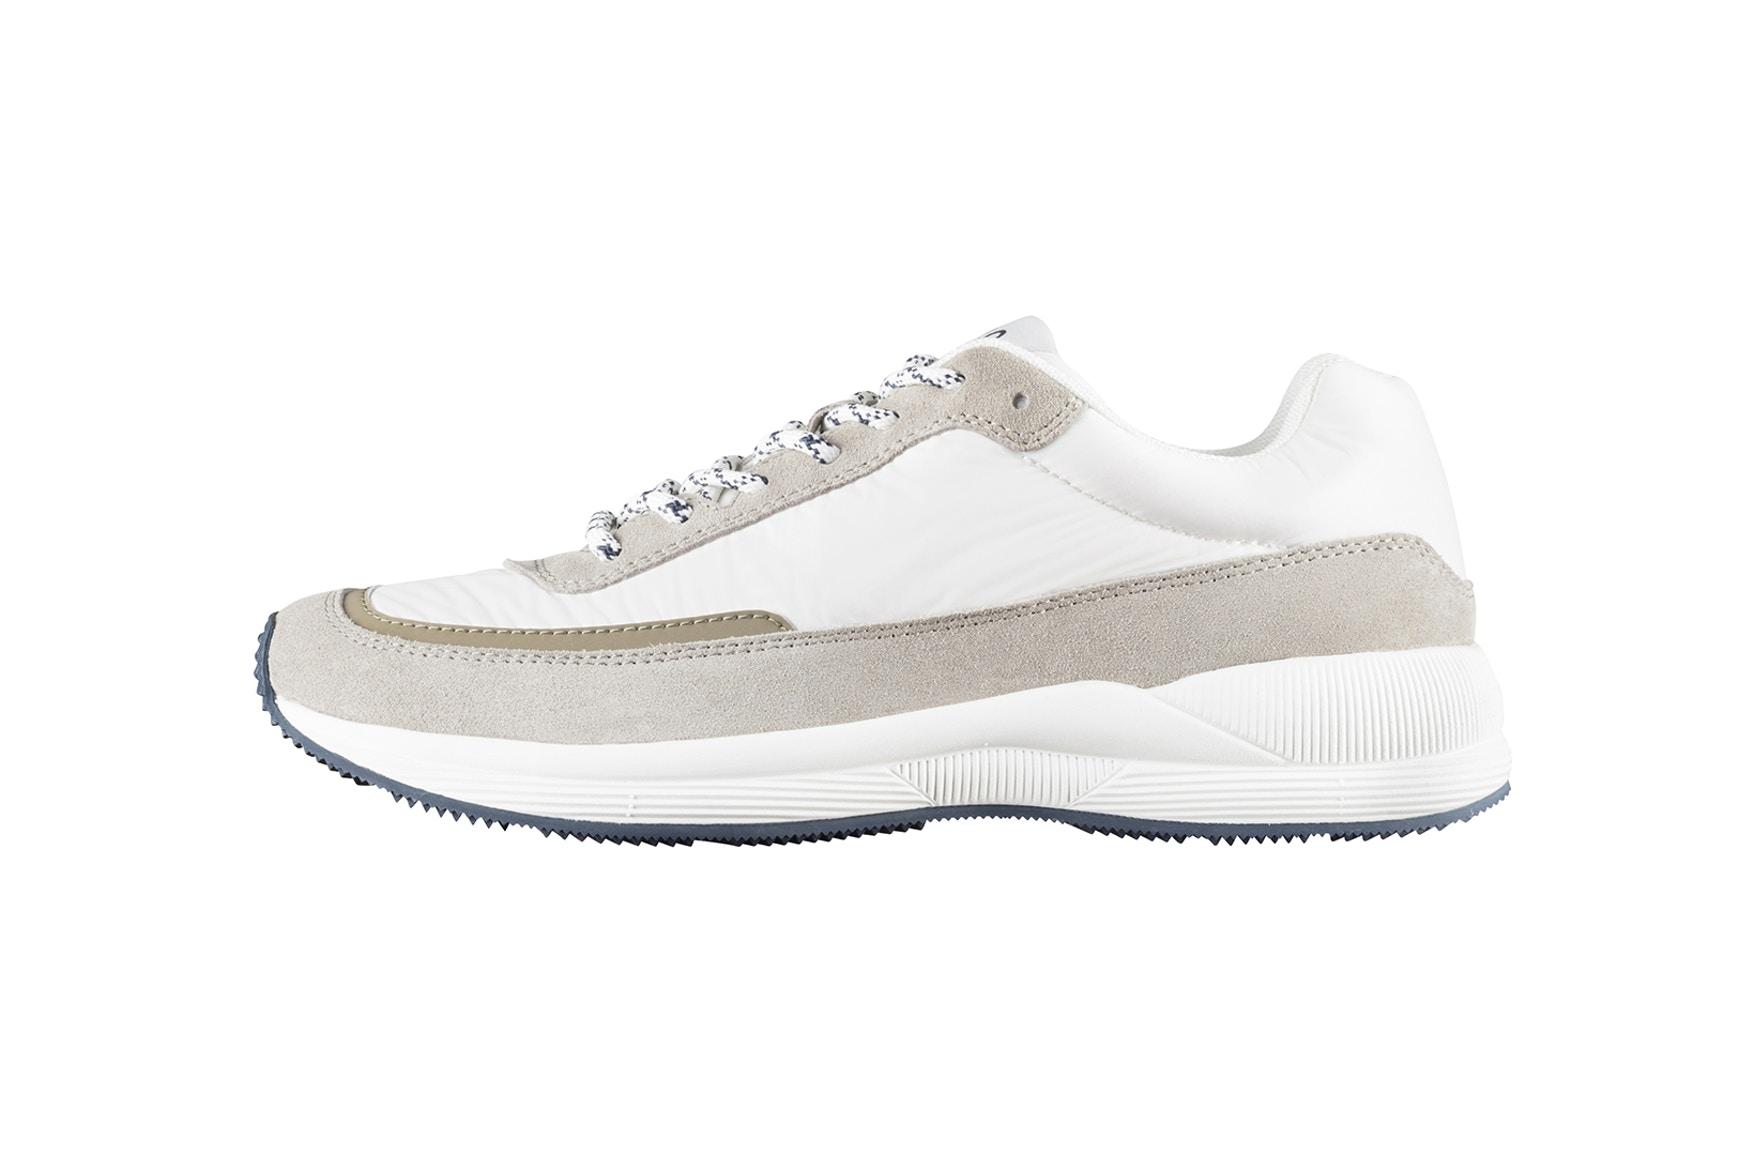 apc-sneakers-spring-summer-2018-1